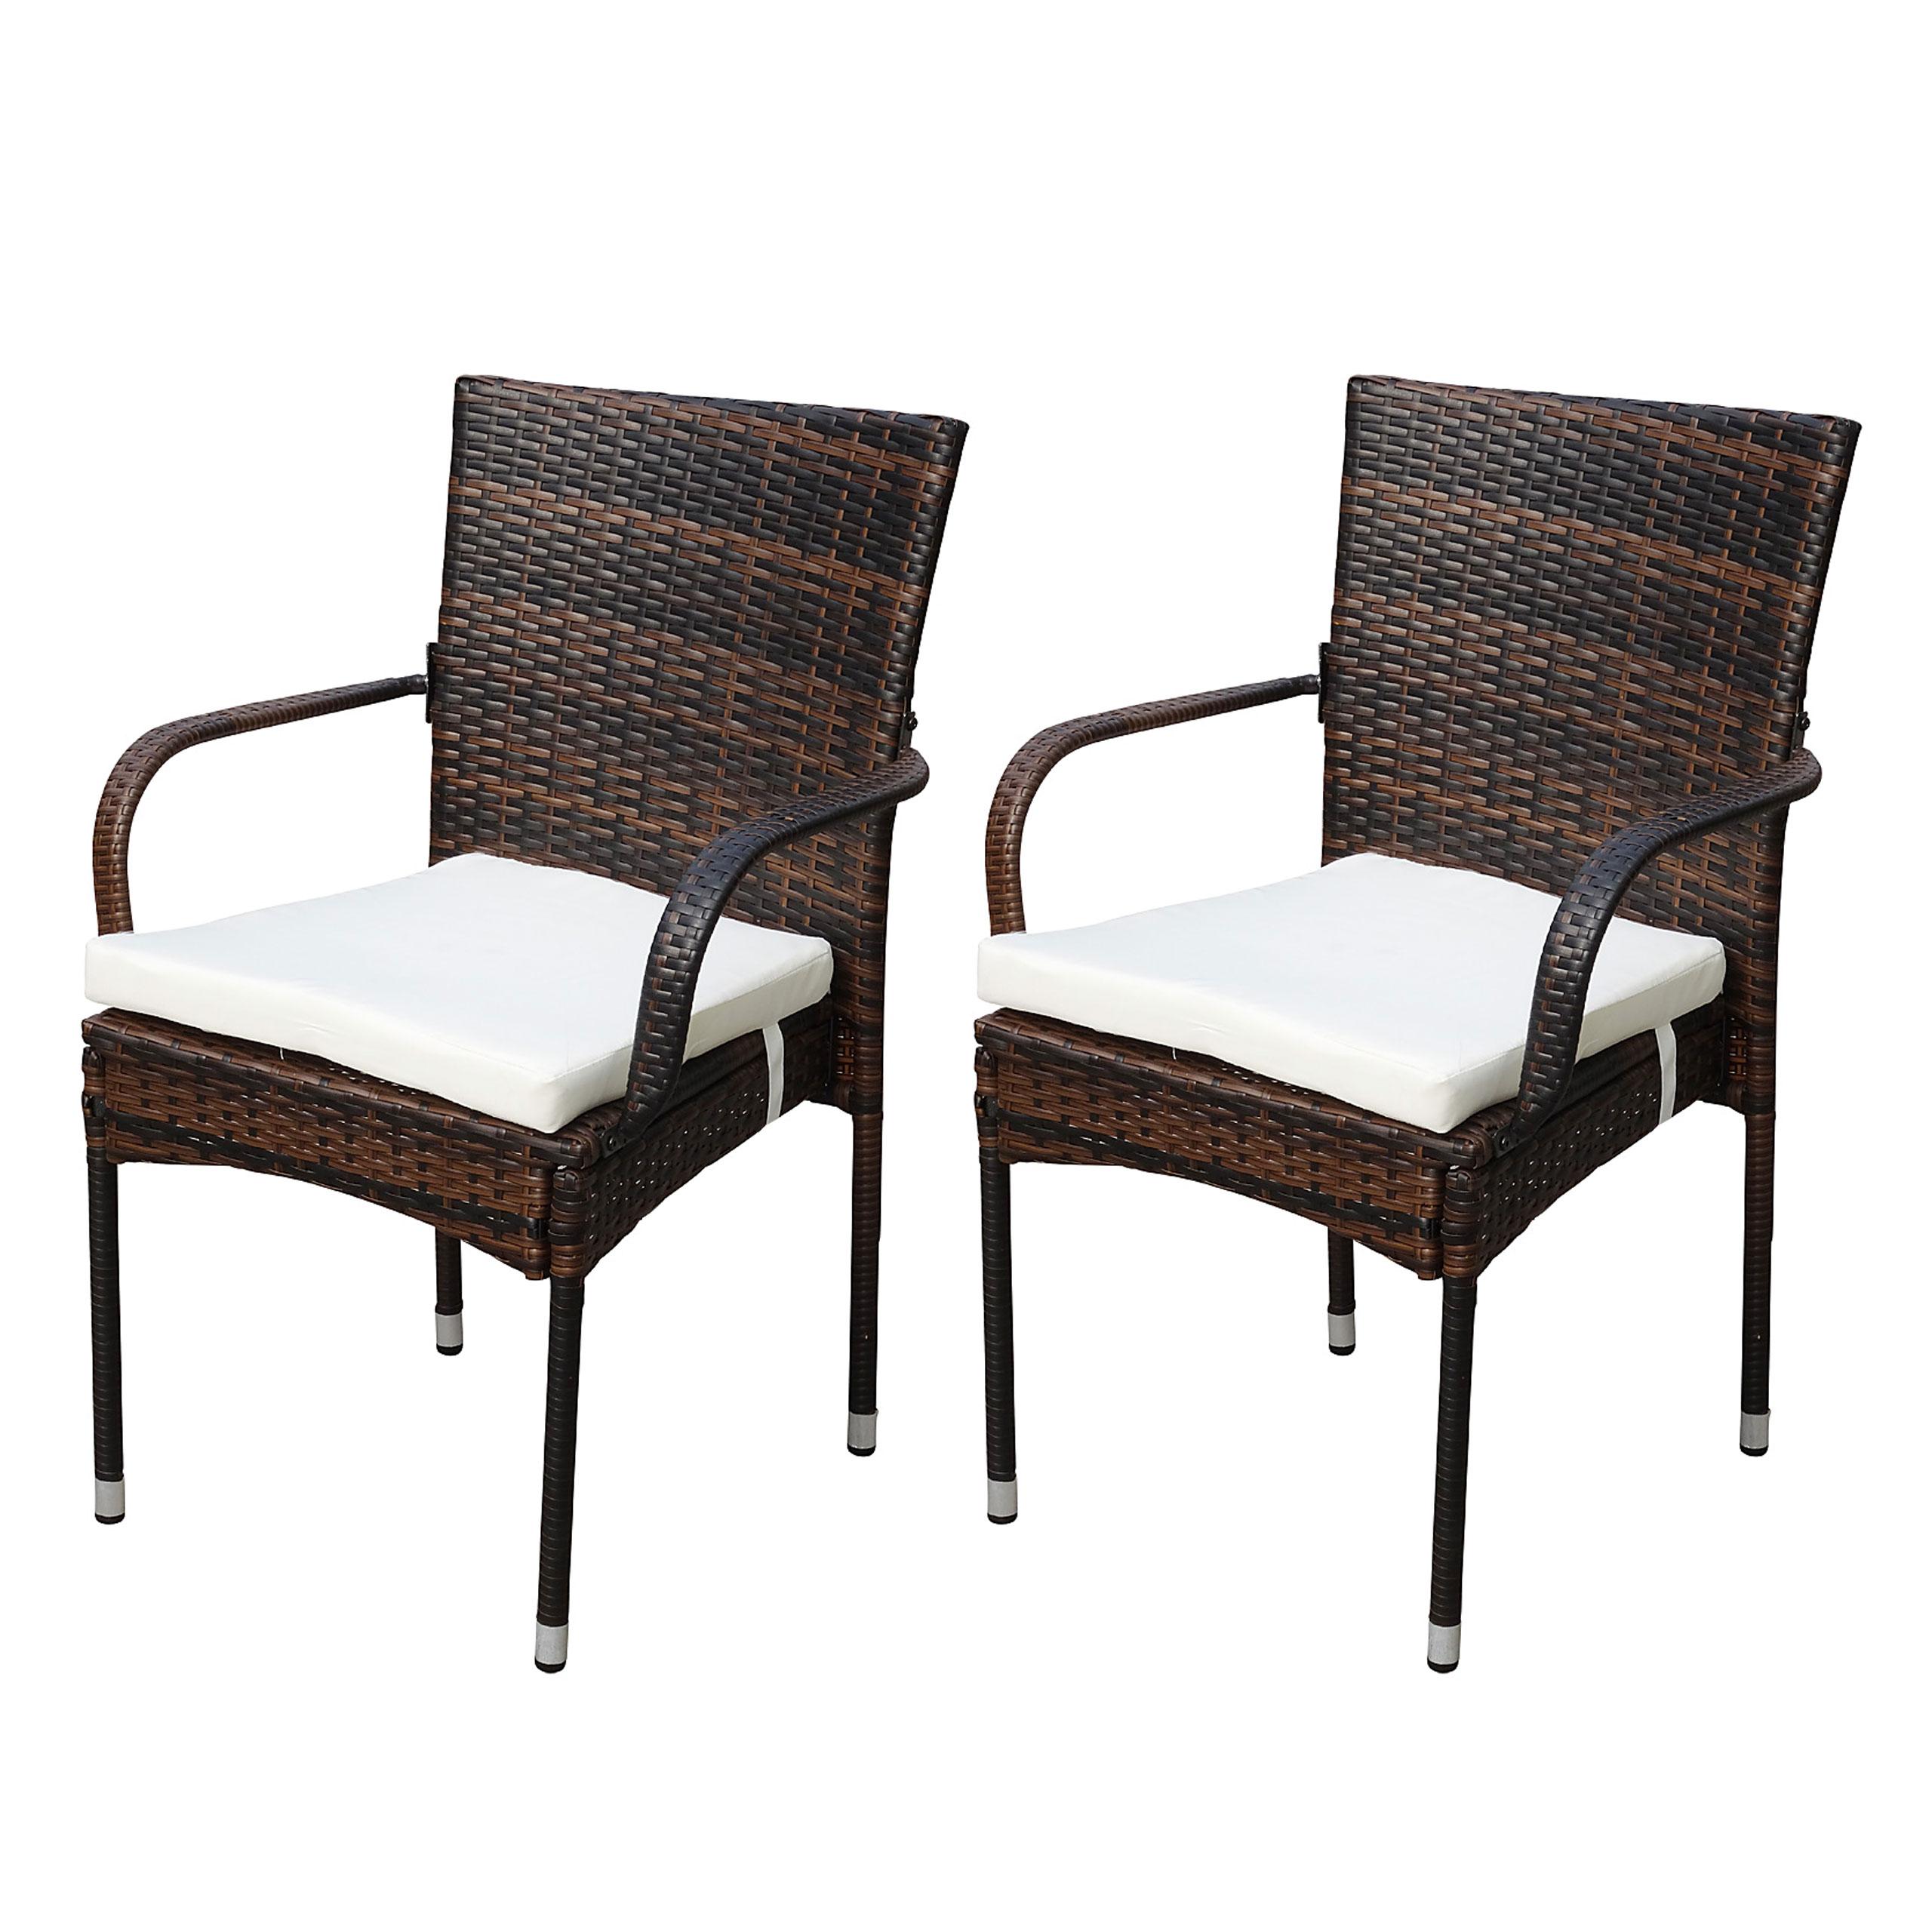 2x poly rattan gartenstuhl ariana stapelstuhl rattanstuhl inkl sitzkissen braun. Black Bedroom Furniture Sets. Home Design Ideas